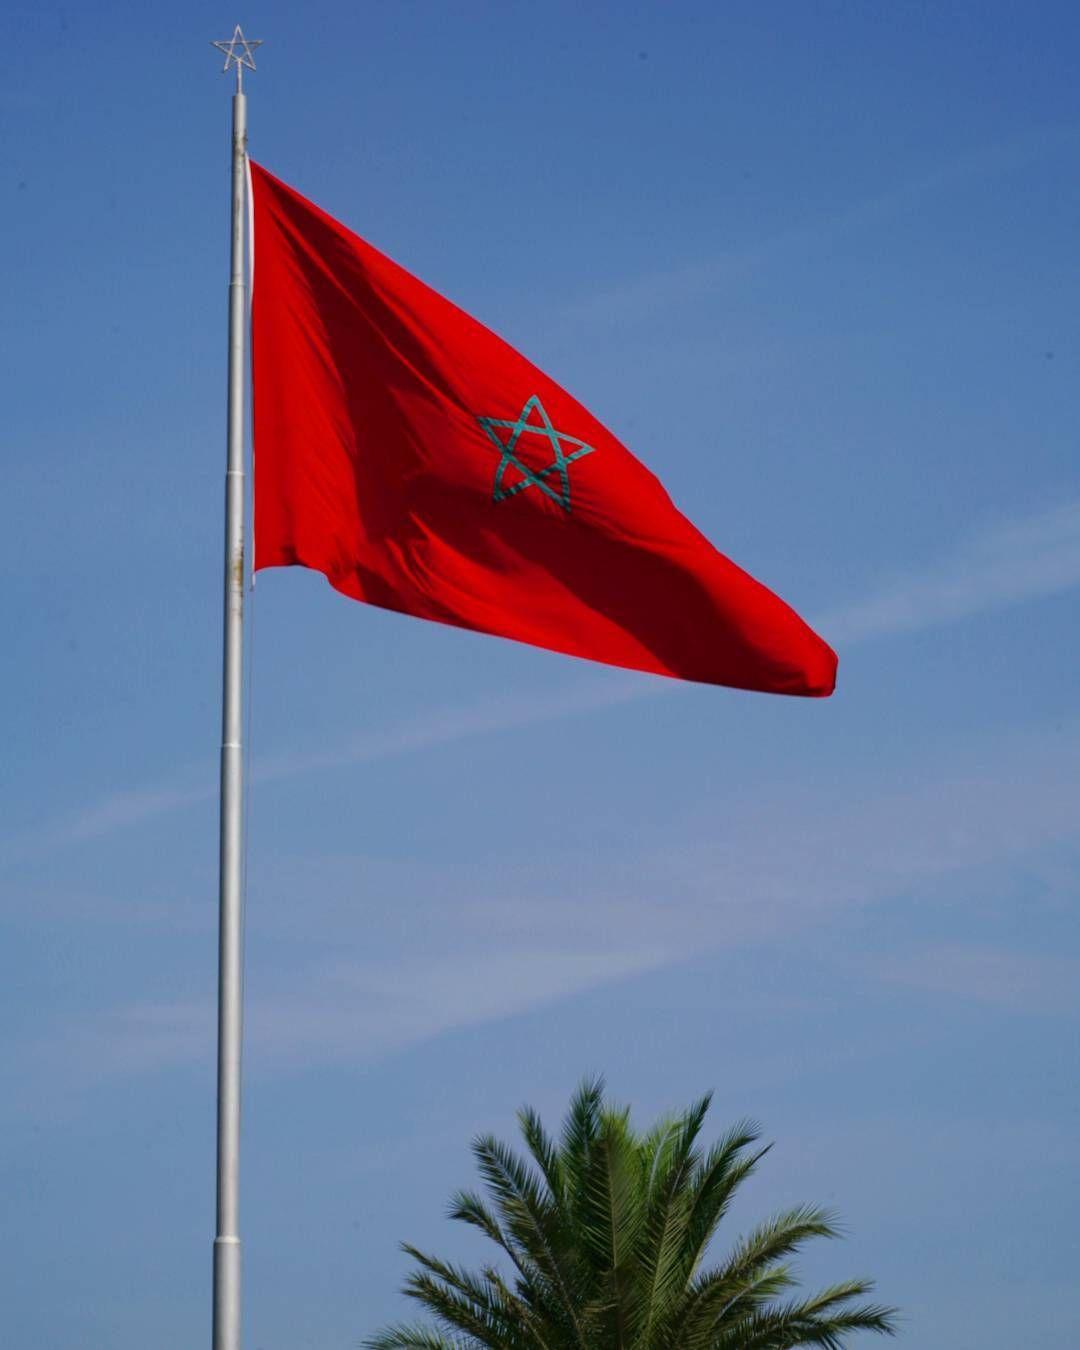 Coming Soon Photo Of Rabat Available On Adobestock Premium Maroc Morroco Flag Drapeau Li Symbole